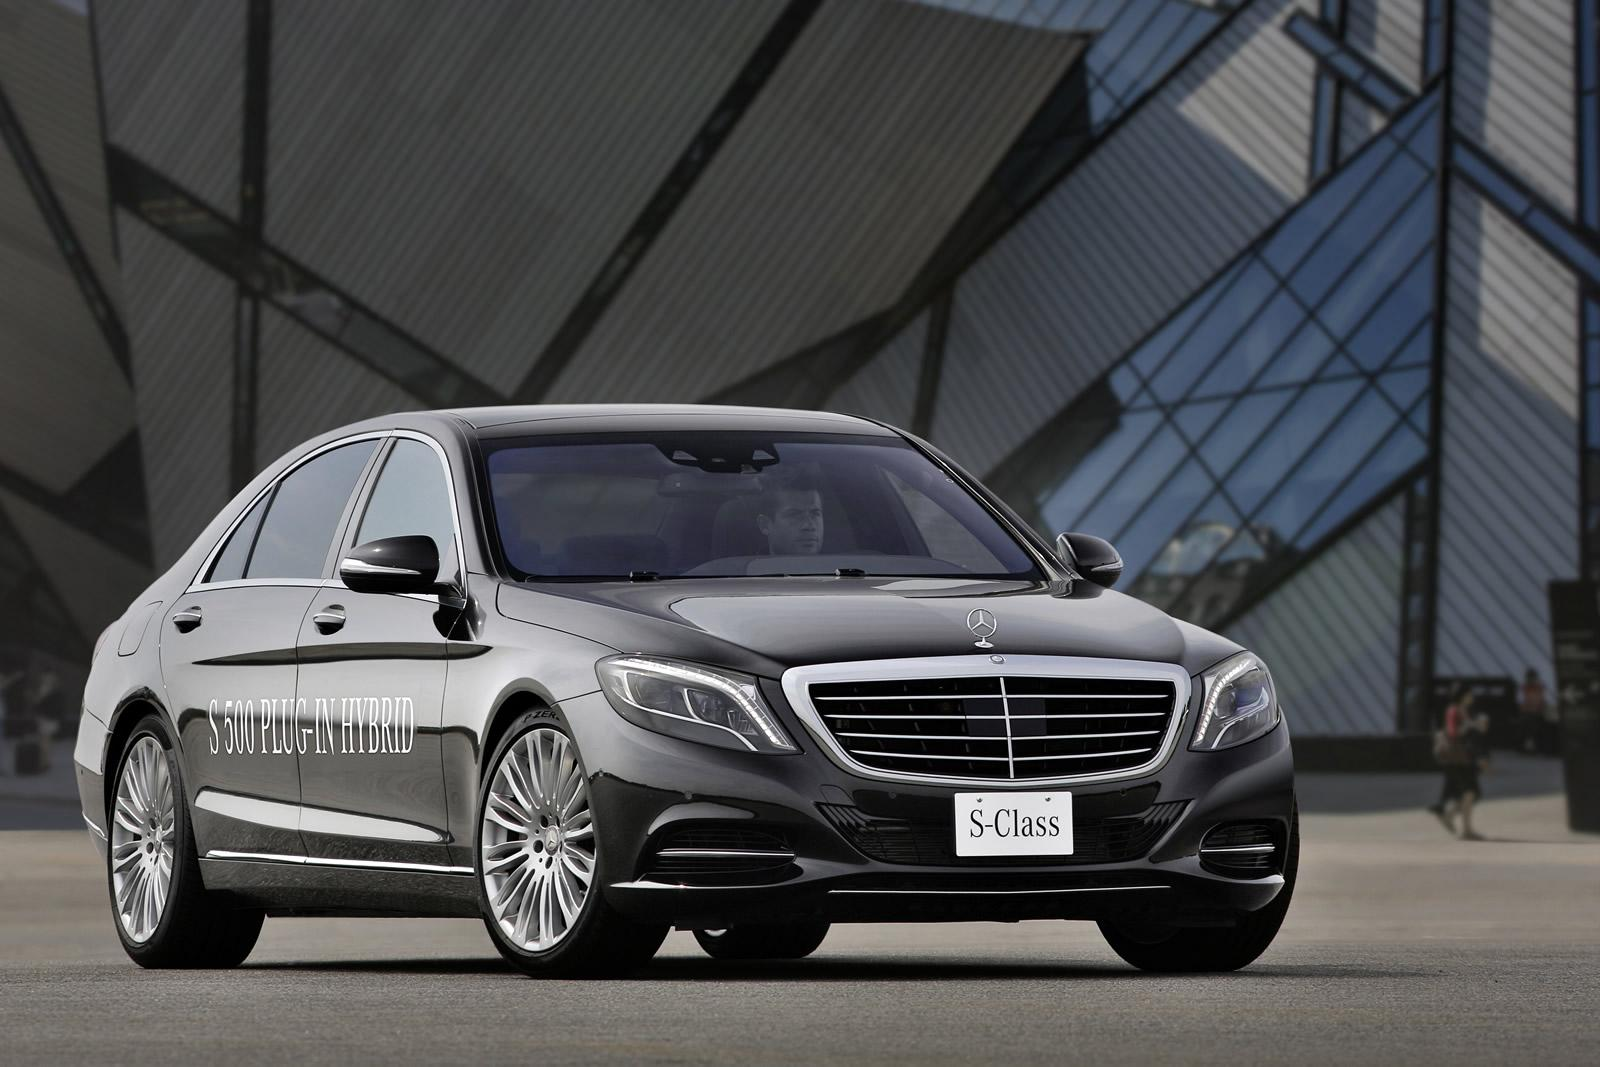 model obj lw benz luxury lws lwo s mercedes hybrid car max models bluetec fbx